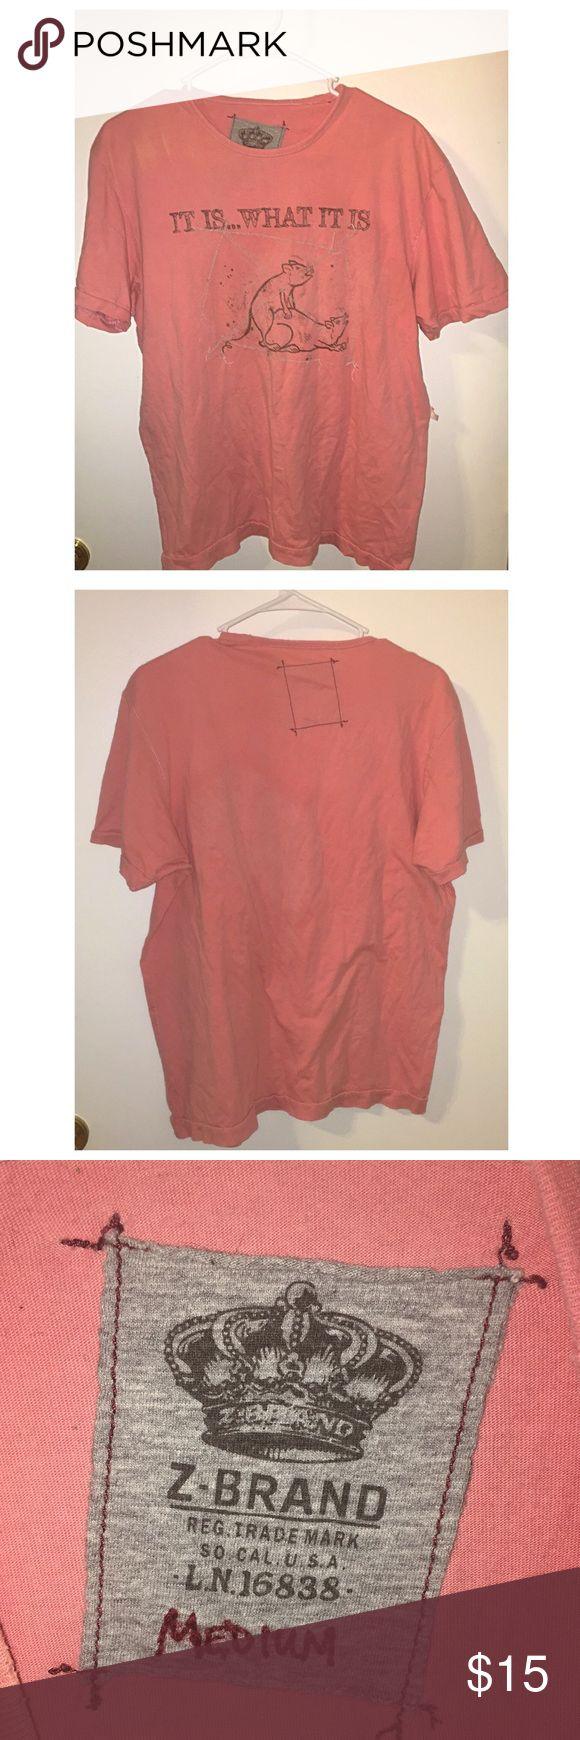 Z Brand T Shirt Z Brand T Shirt size medium. Shirts Tees - Short Sleeve